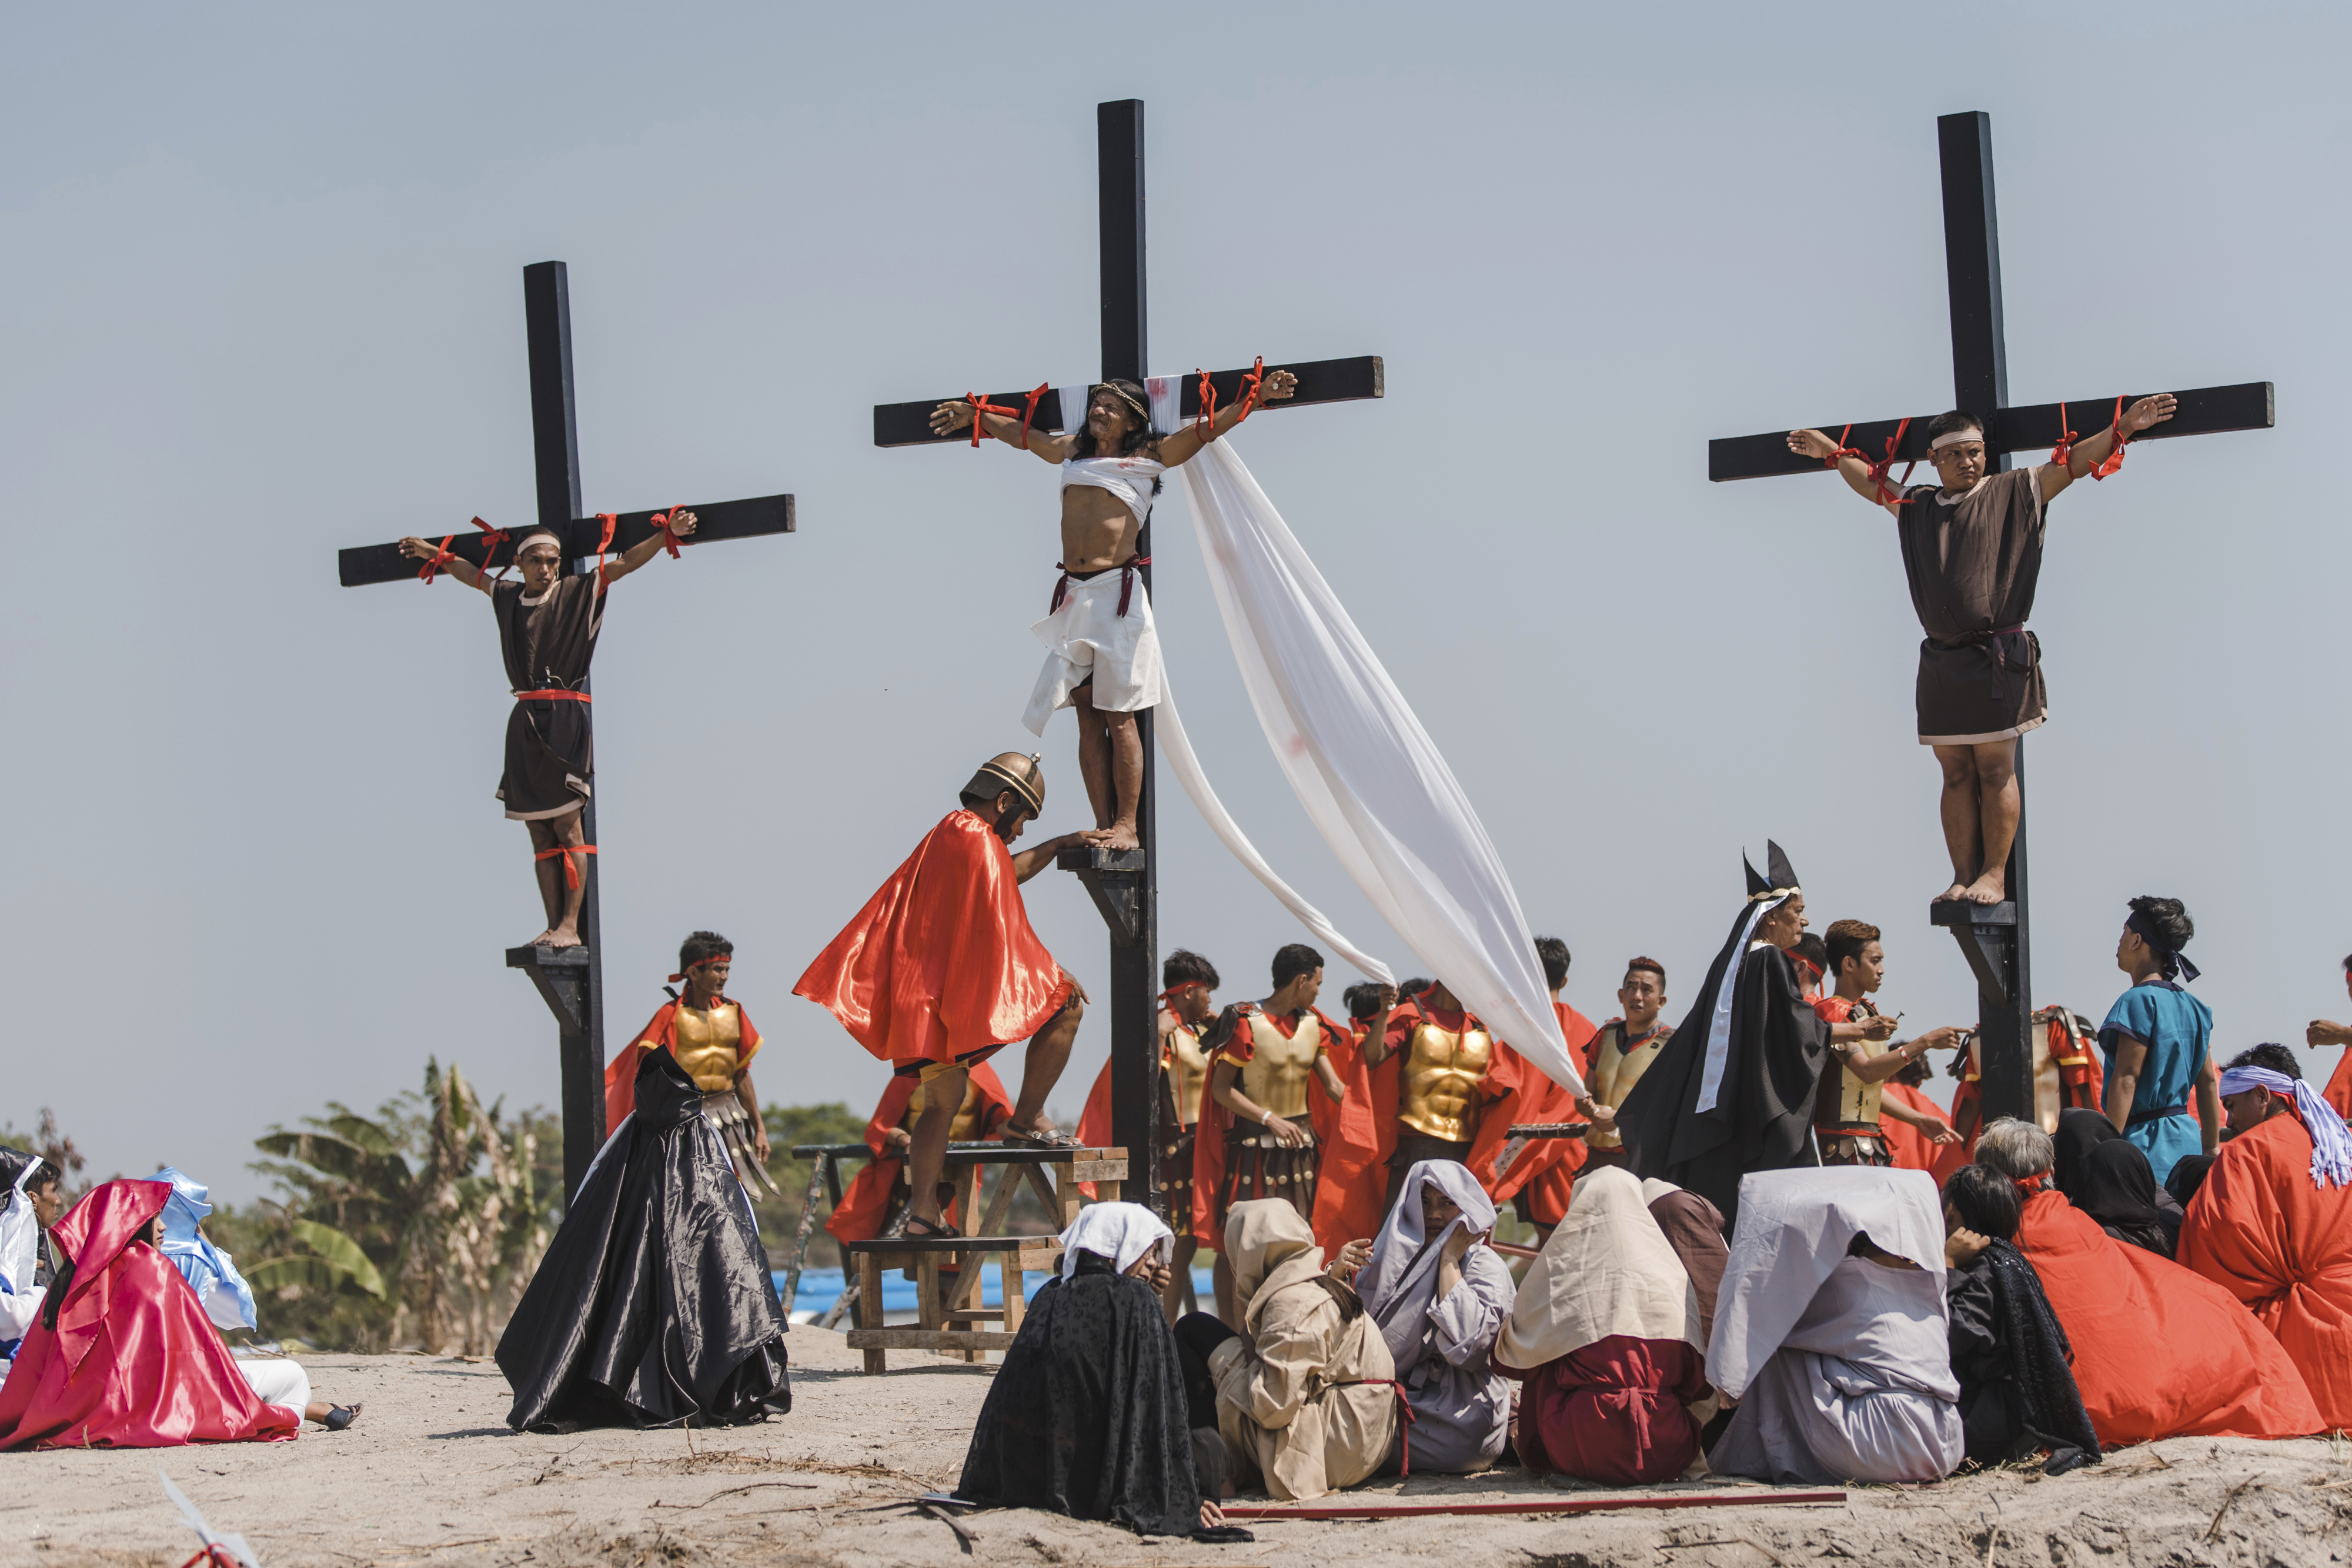 Philippines Crucifixion Reenactment_1555700988113